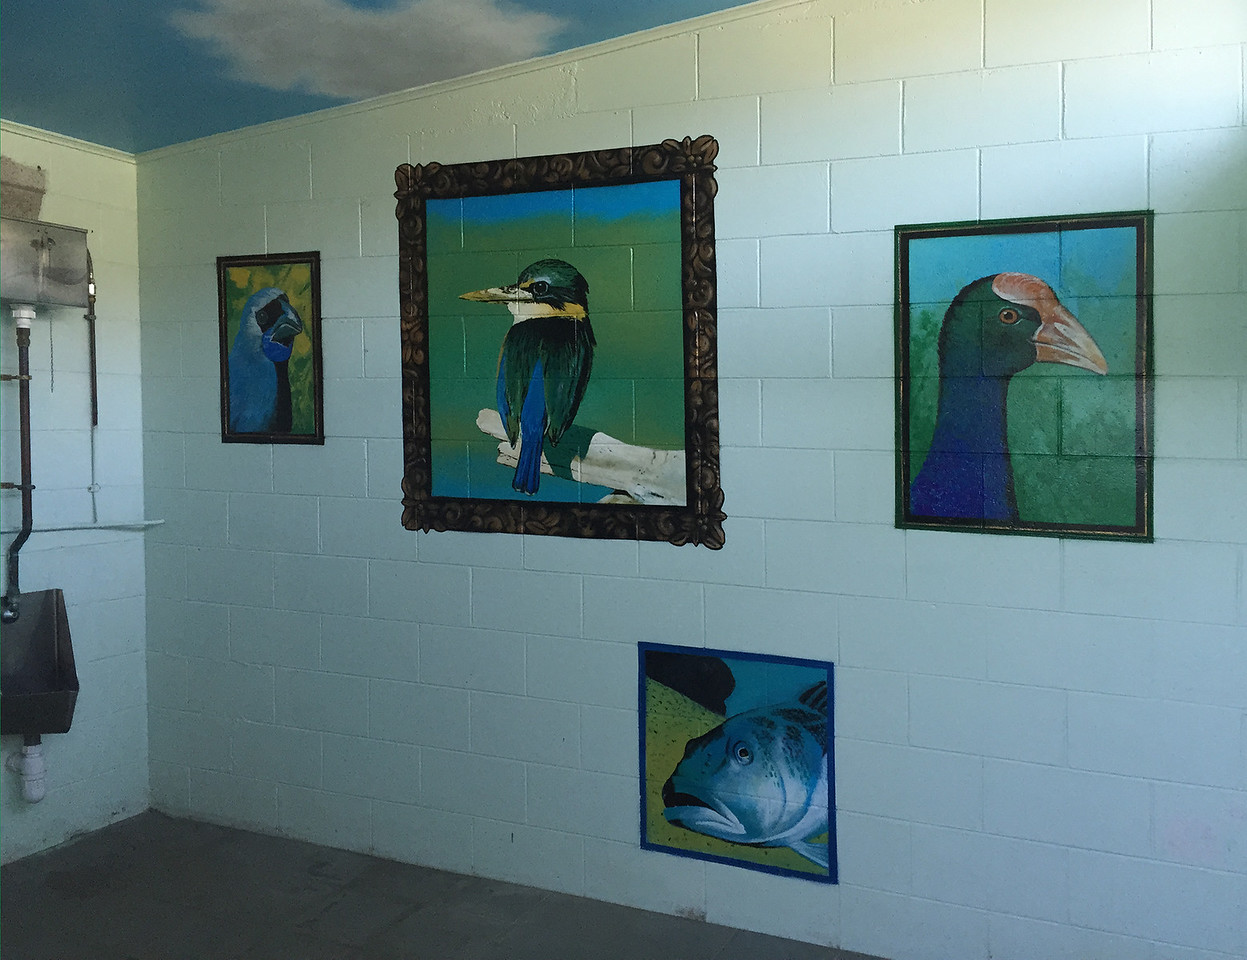 Wall paintings inside public toilet at Tata Beach - Tarakohe, New Zealand